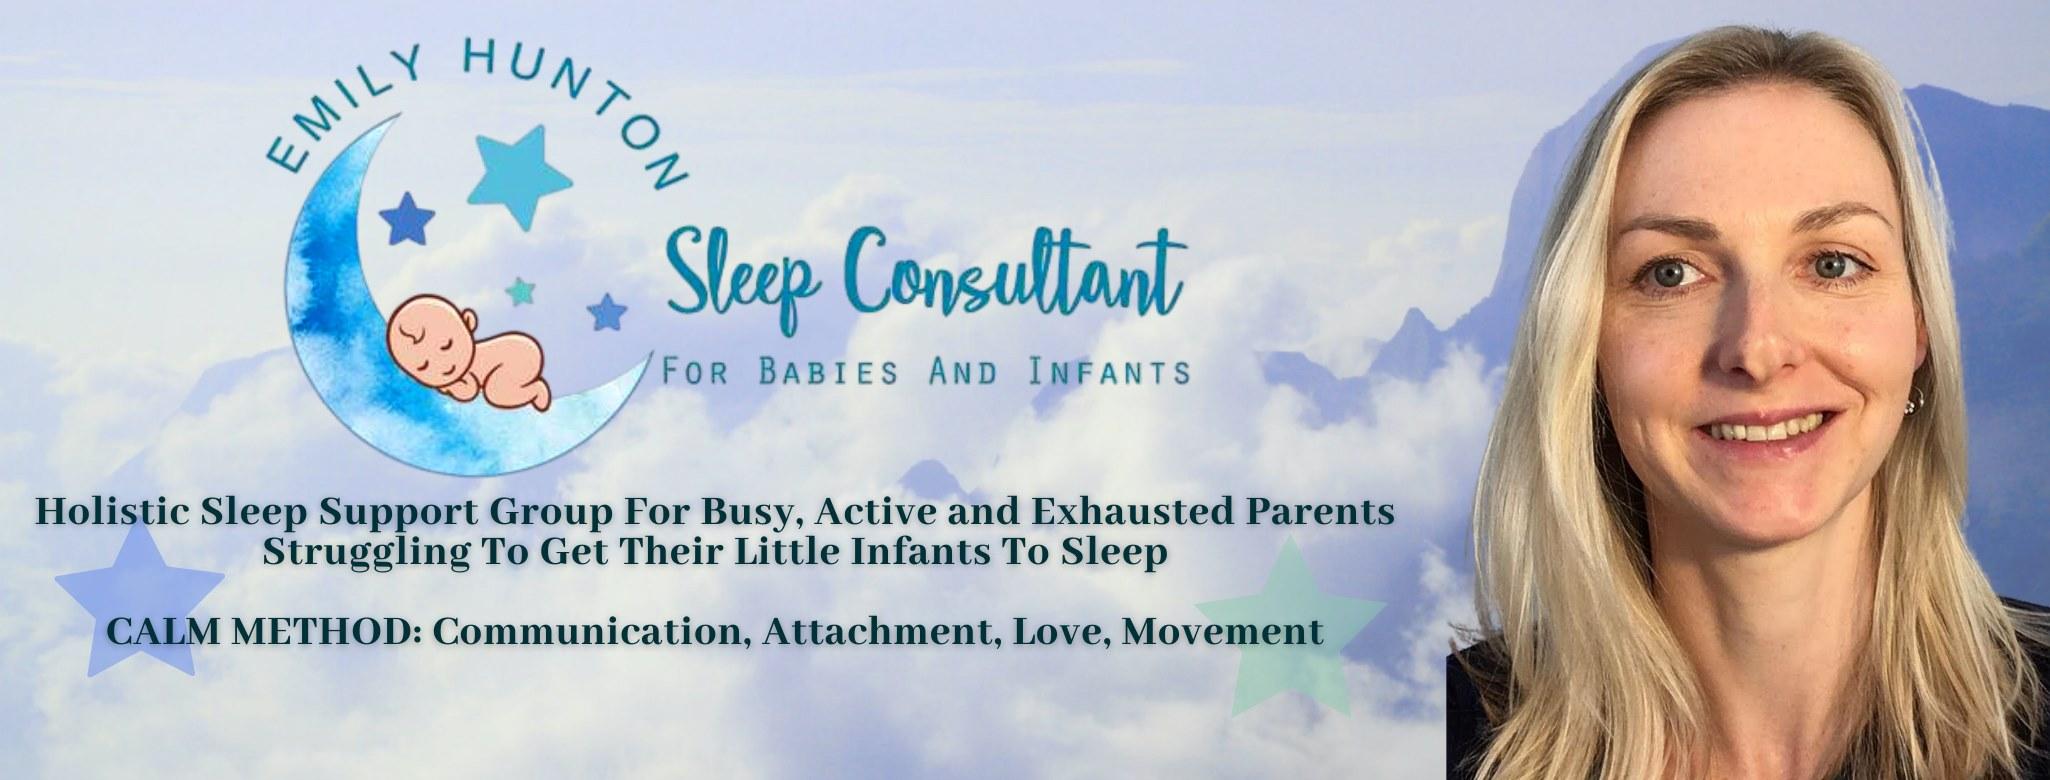 Emily Sleep Consultant 's main image